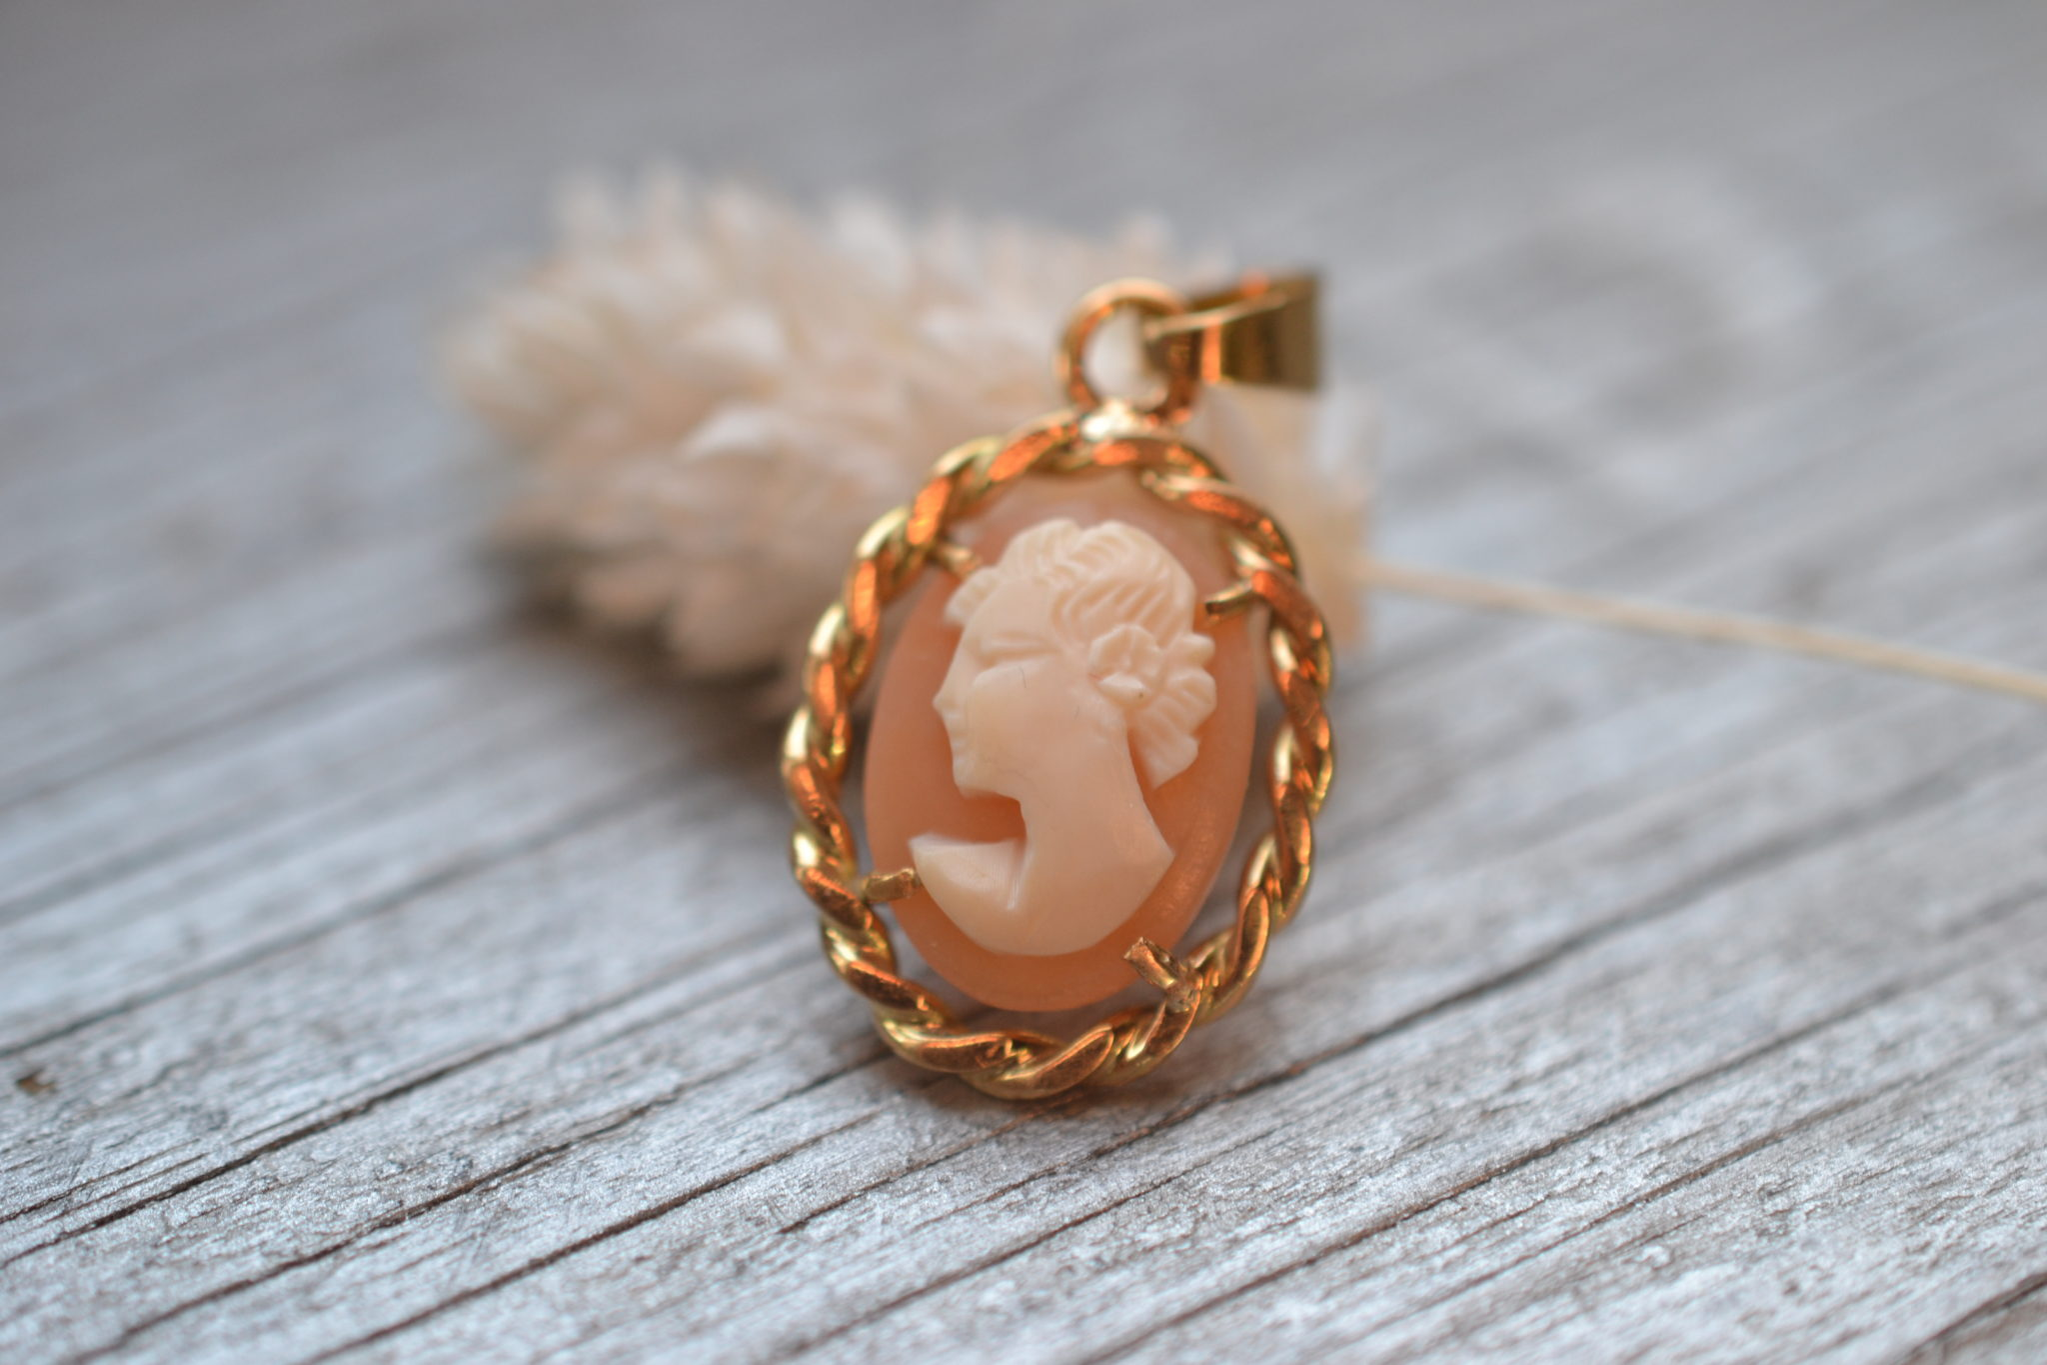 pendentif ancien camée en or jaune 18 carats massif - bijoux anciens et occasion